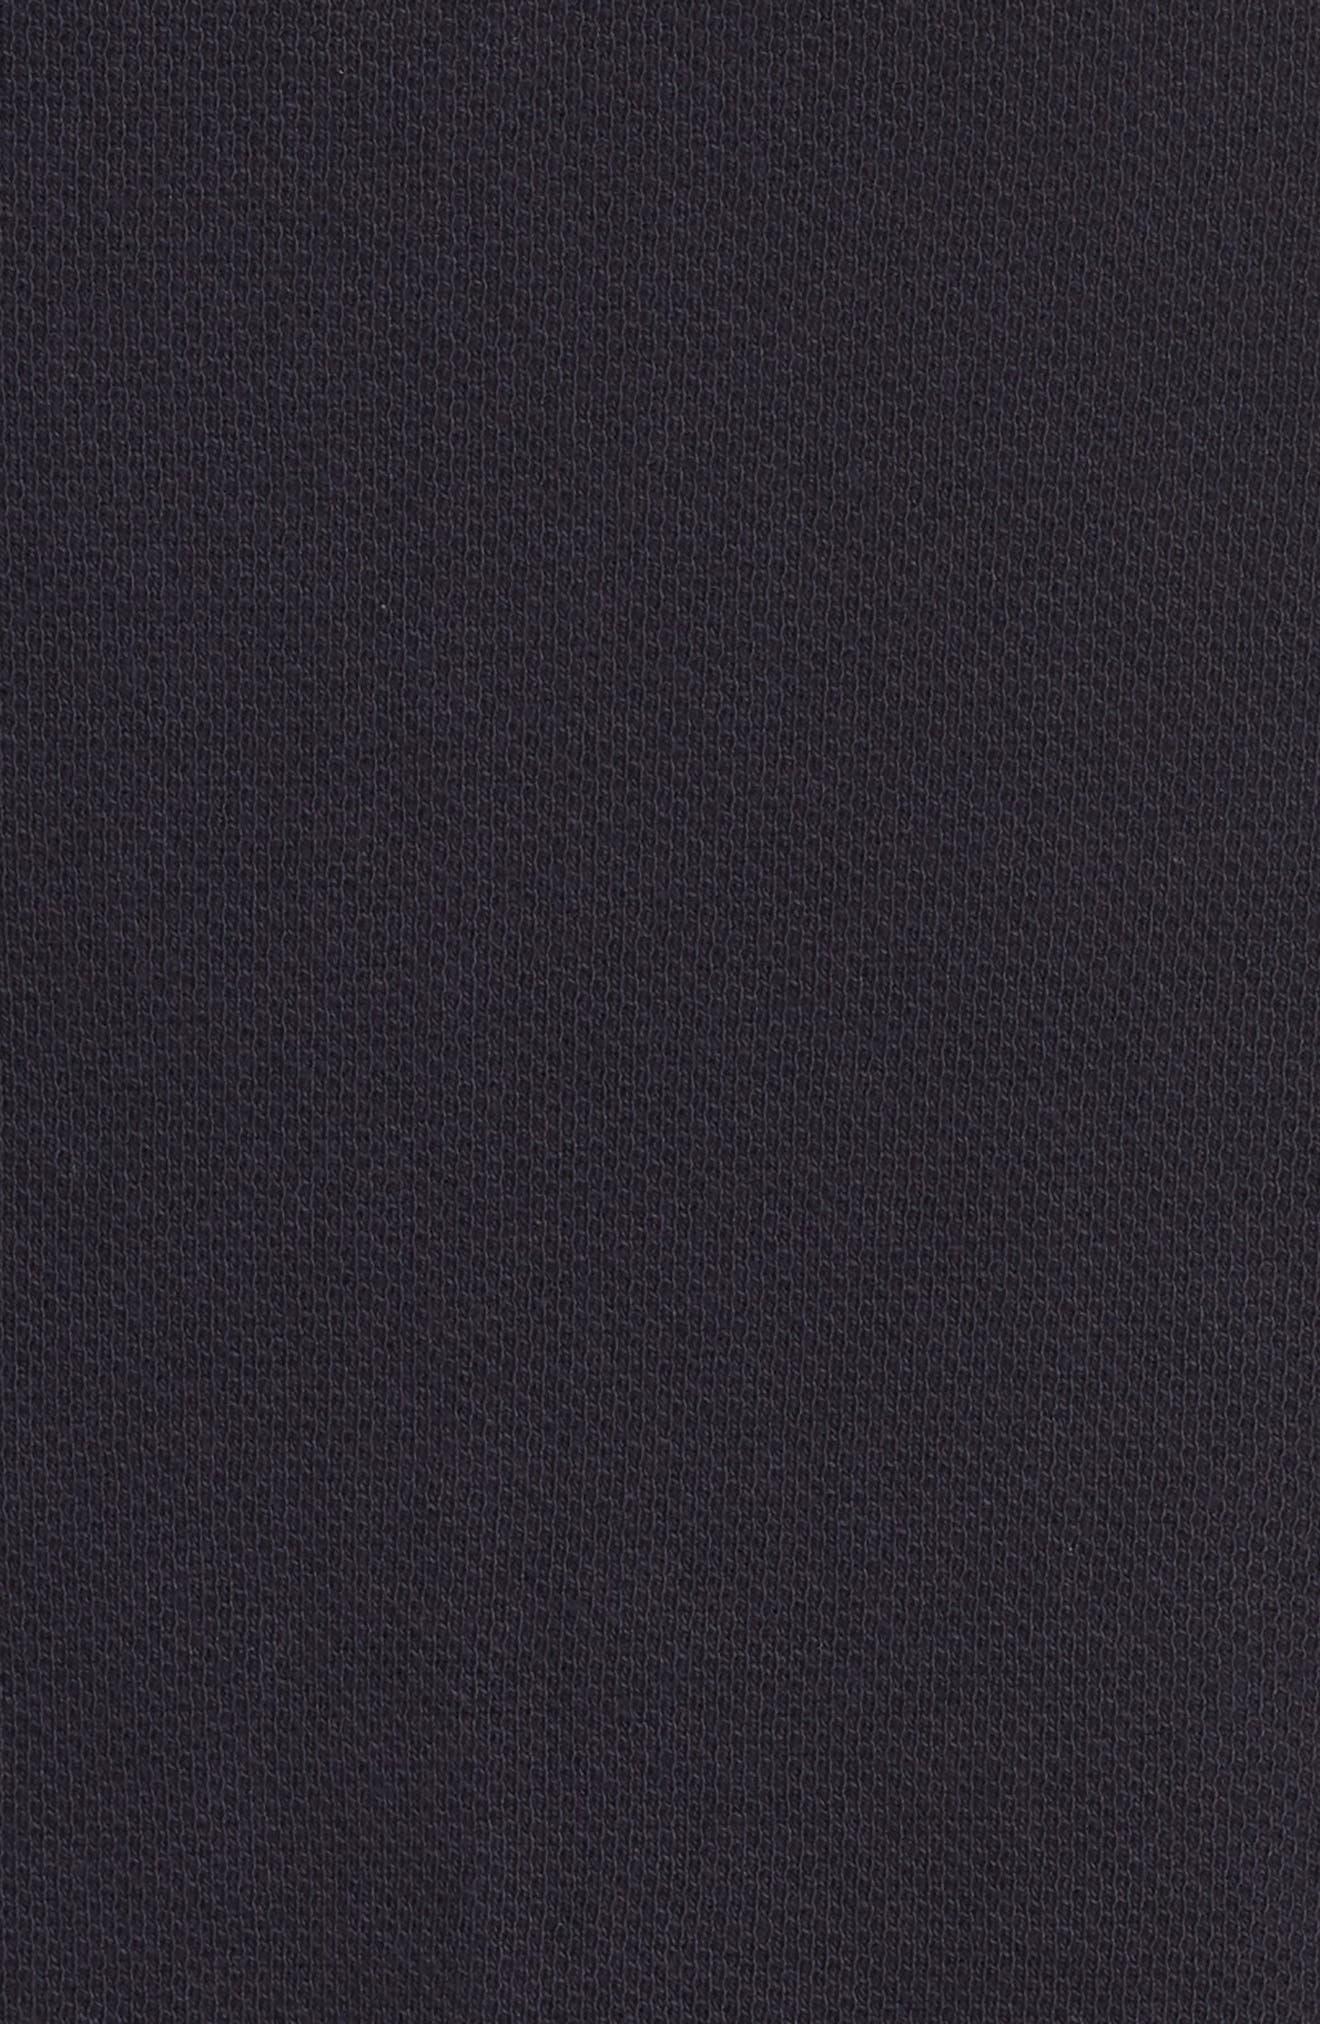 Jirgi Front Zip Sweater,                             Alternate thumbnail 5, color,                             400